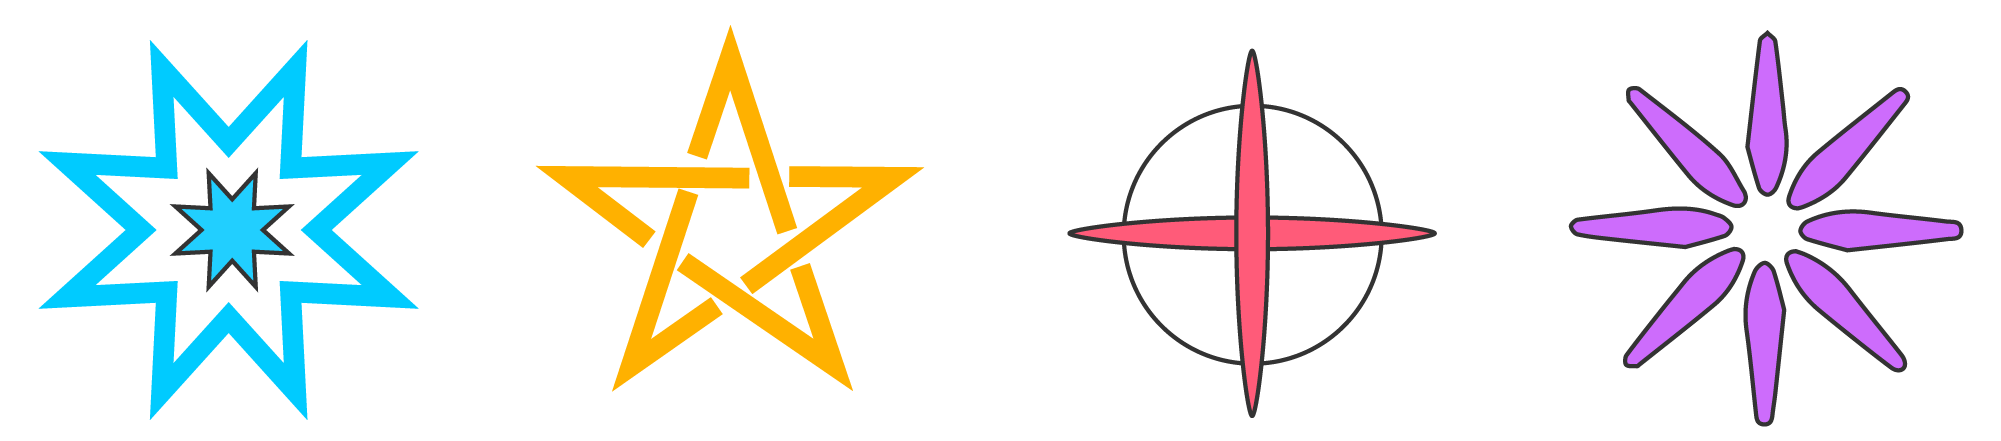 Pentagram Example